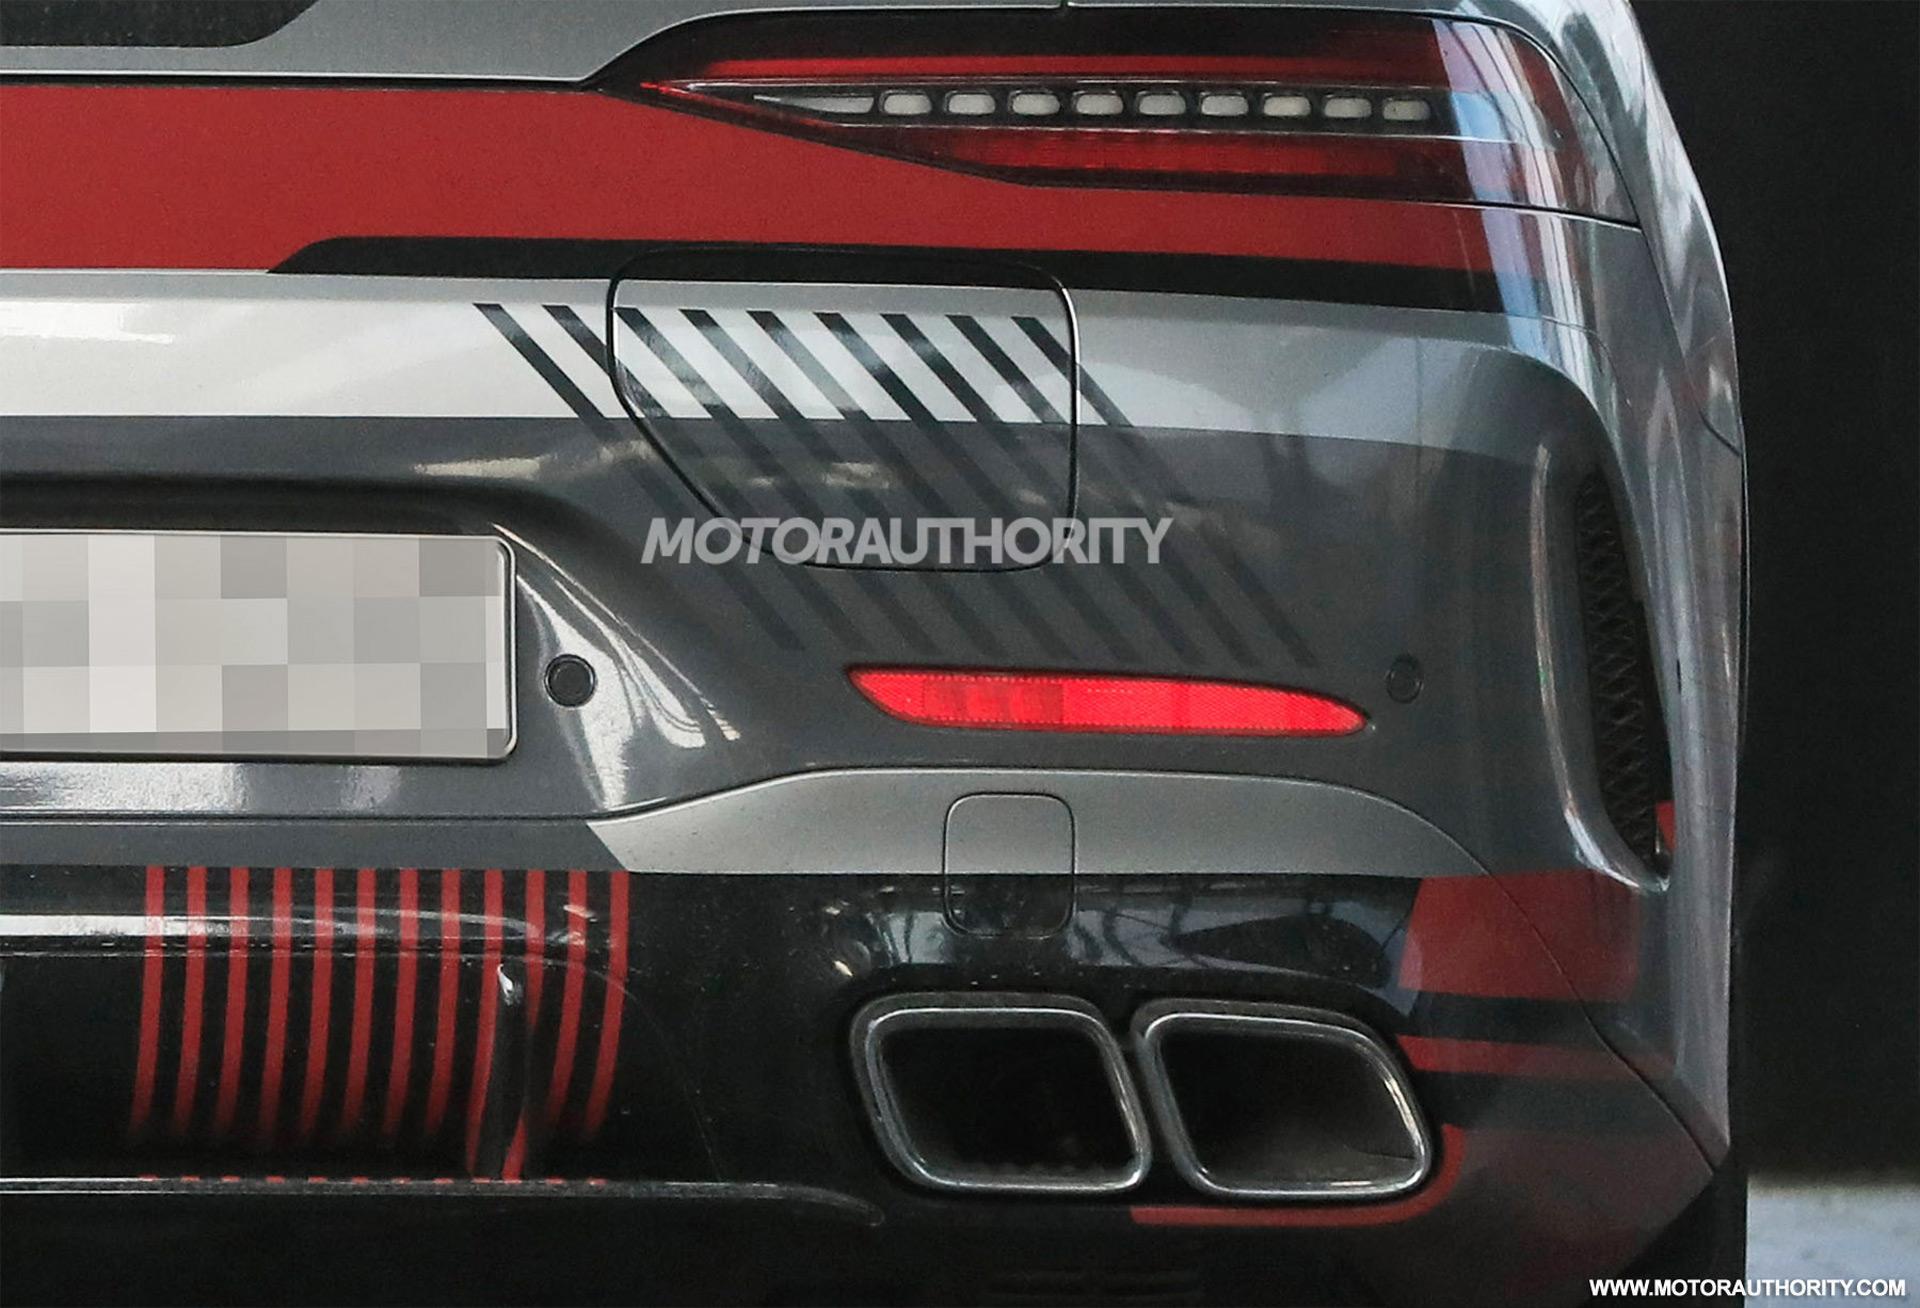 2022 Mercedes-Benz AMG GT 73e Coupe 4 cửa bị gián điệp - Ảnh: S. Baldauf / SB-Medien